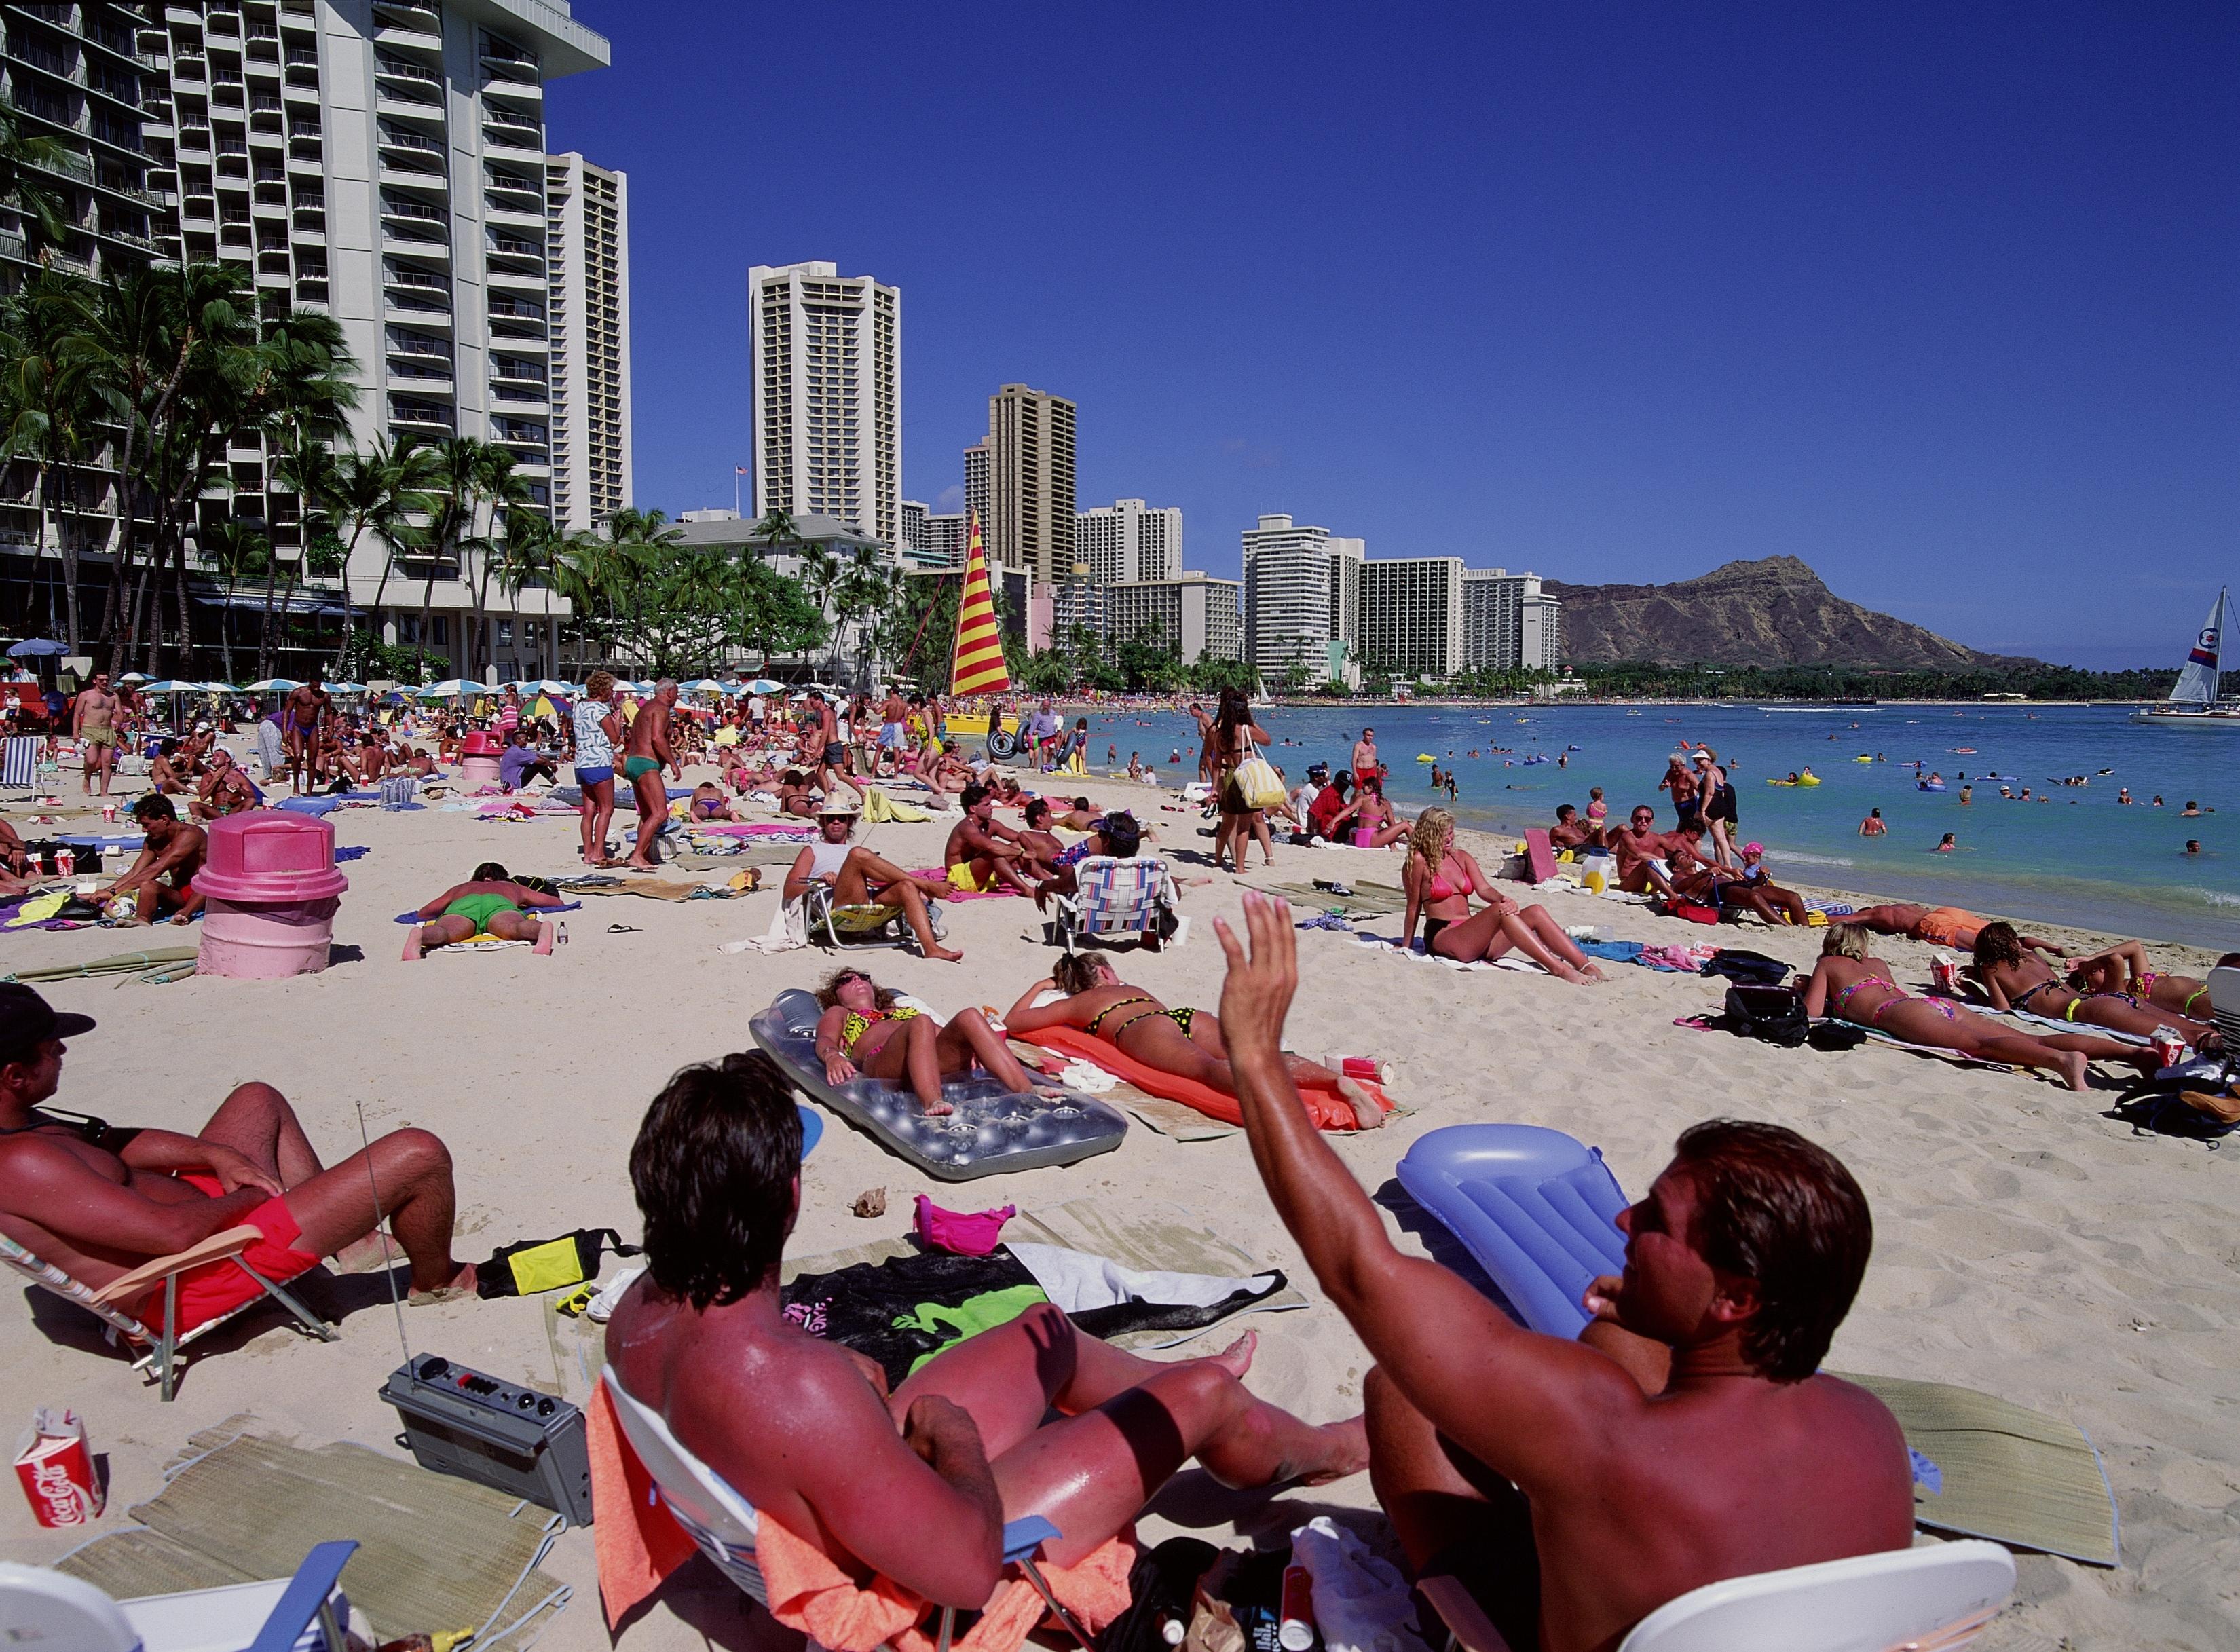 The Busiest Time to Visit Waikiki, Hawaii